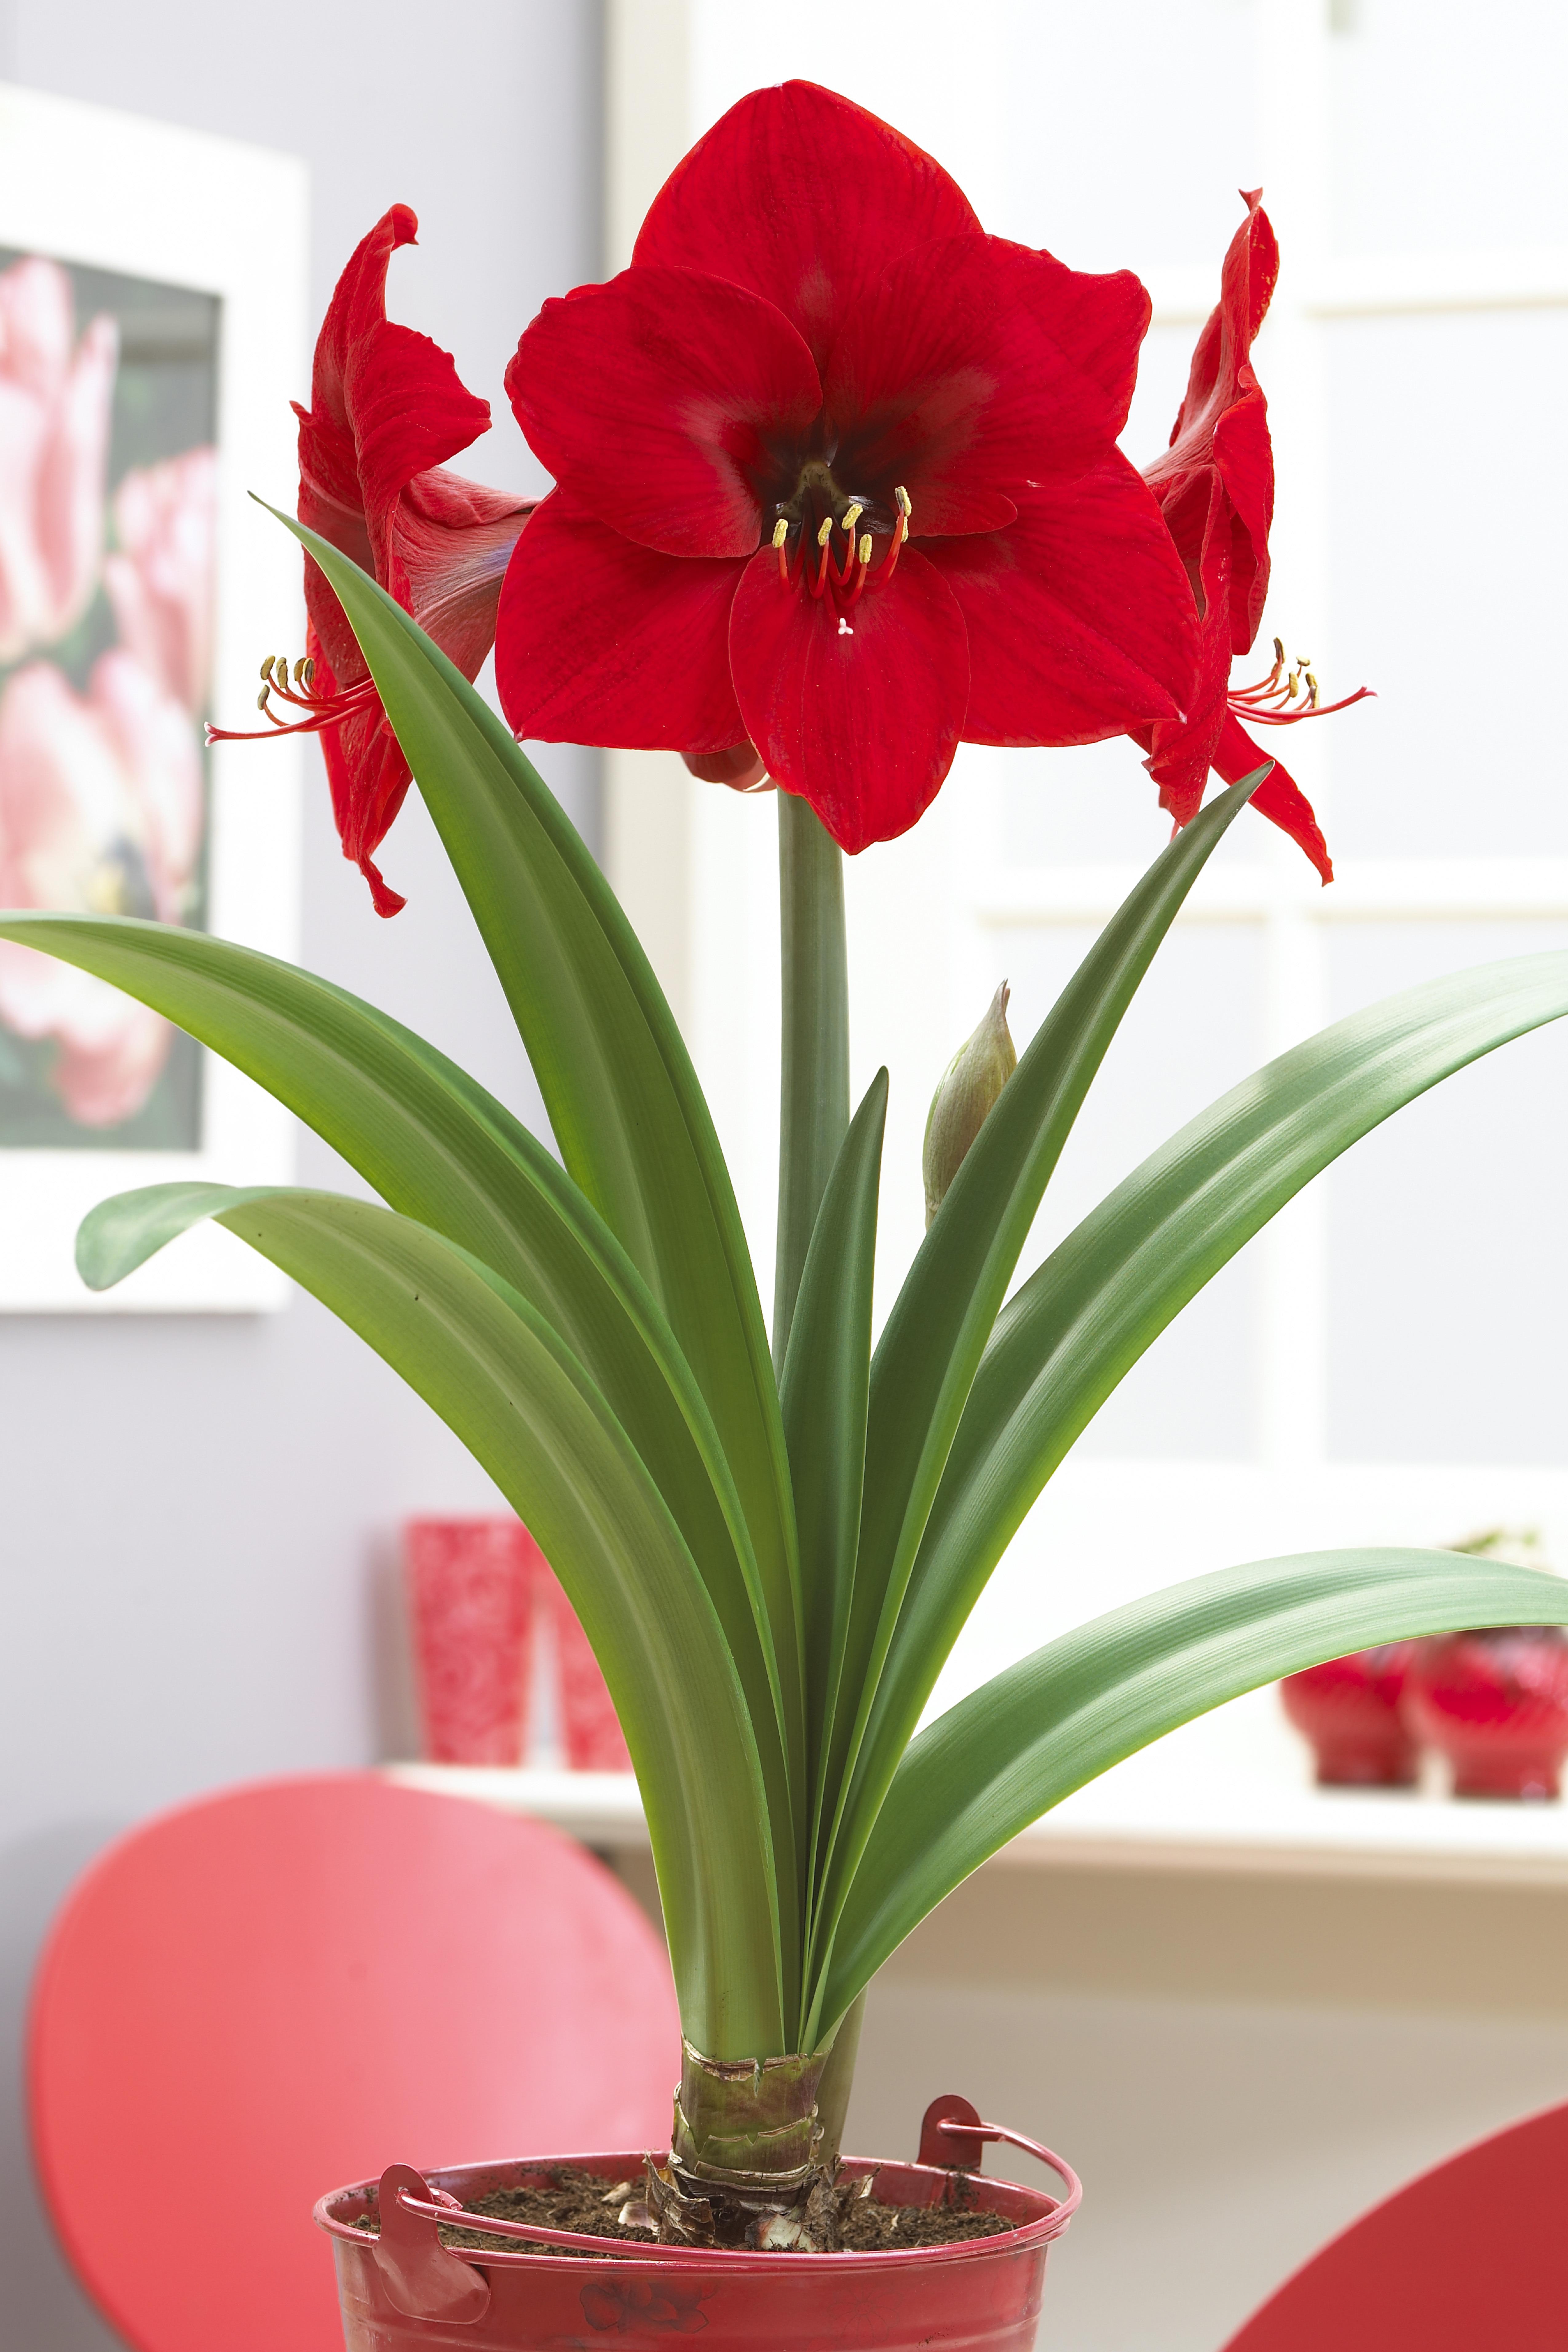 Bloomsz economy amaryllis red lion 12 pack bloomsz for Planter des amaryllis